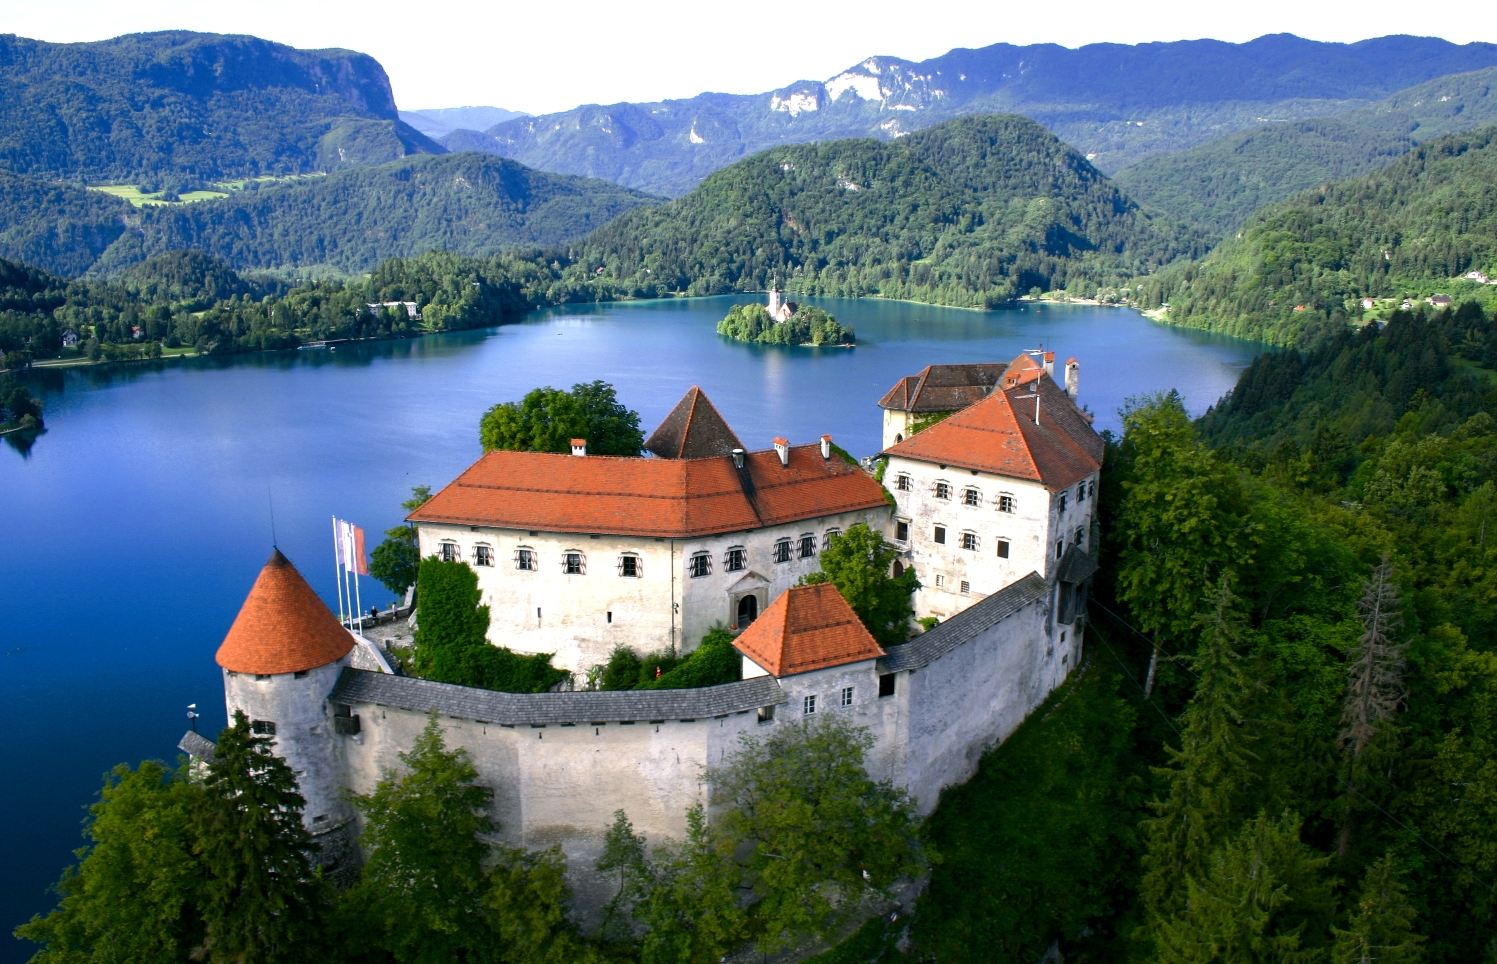 Bled Castle Aerial View Slovenia Tours